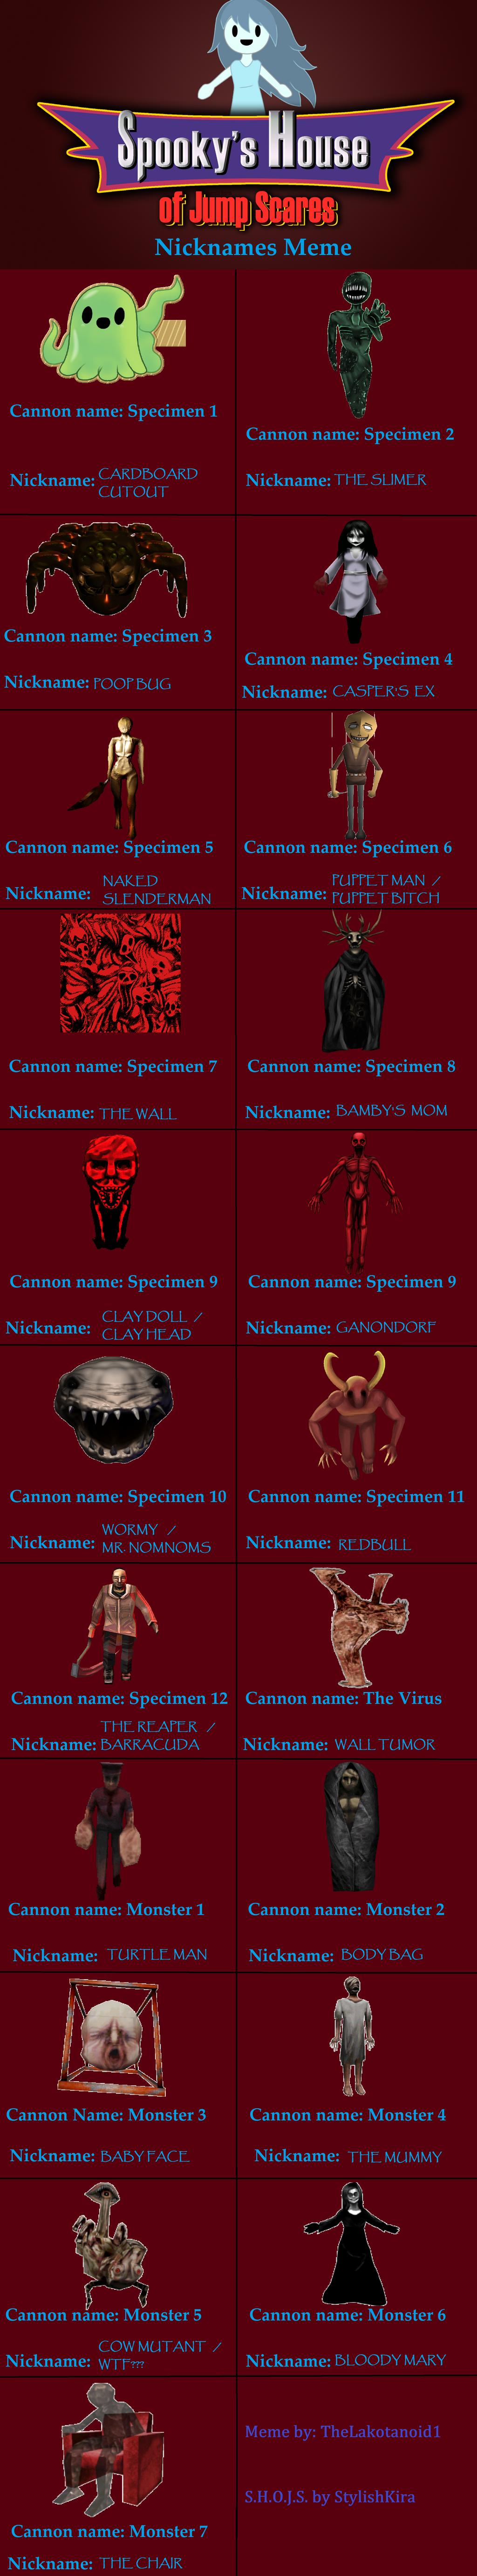 Spookys house of jumpscare e621 -  Spooky S House Of Jump Scares Nickname Meme Mine By Thelakotanoid1